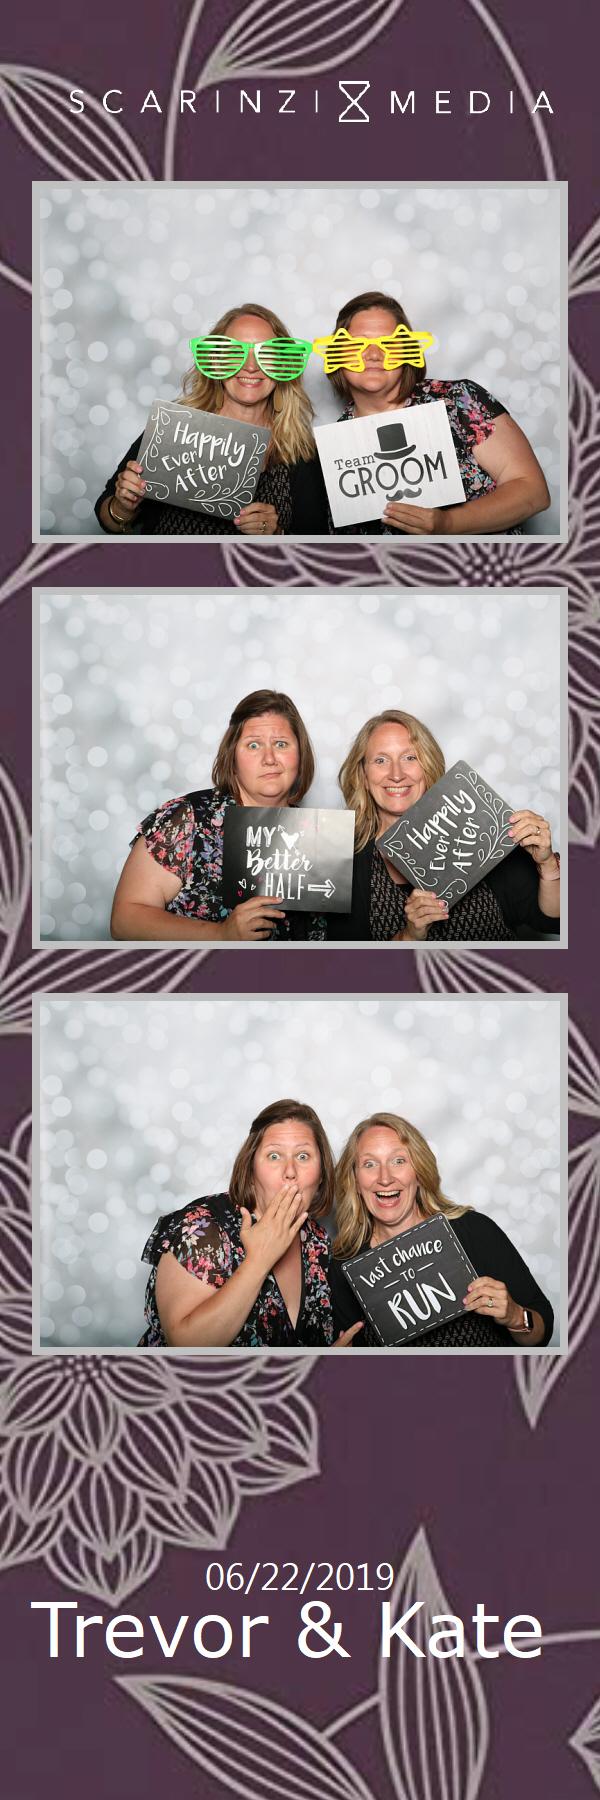 2019.06.22 - Barney Wedding PHOTOBOOTH01.jpg